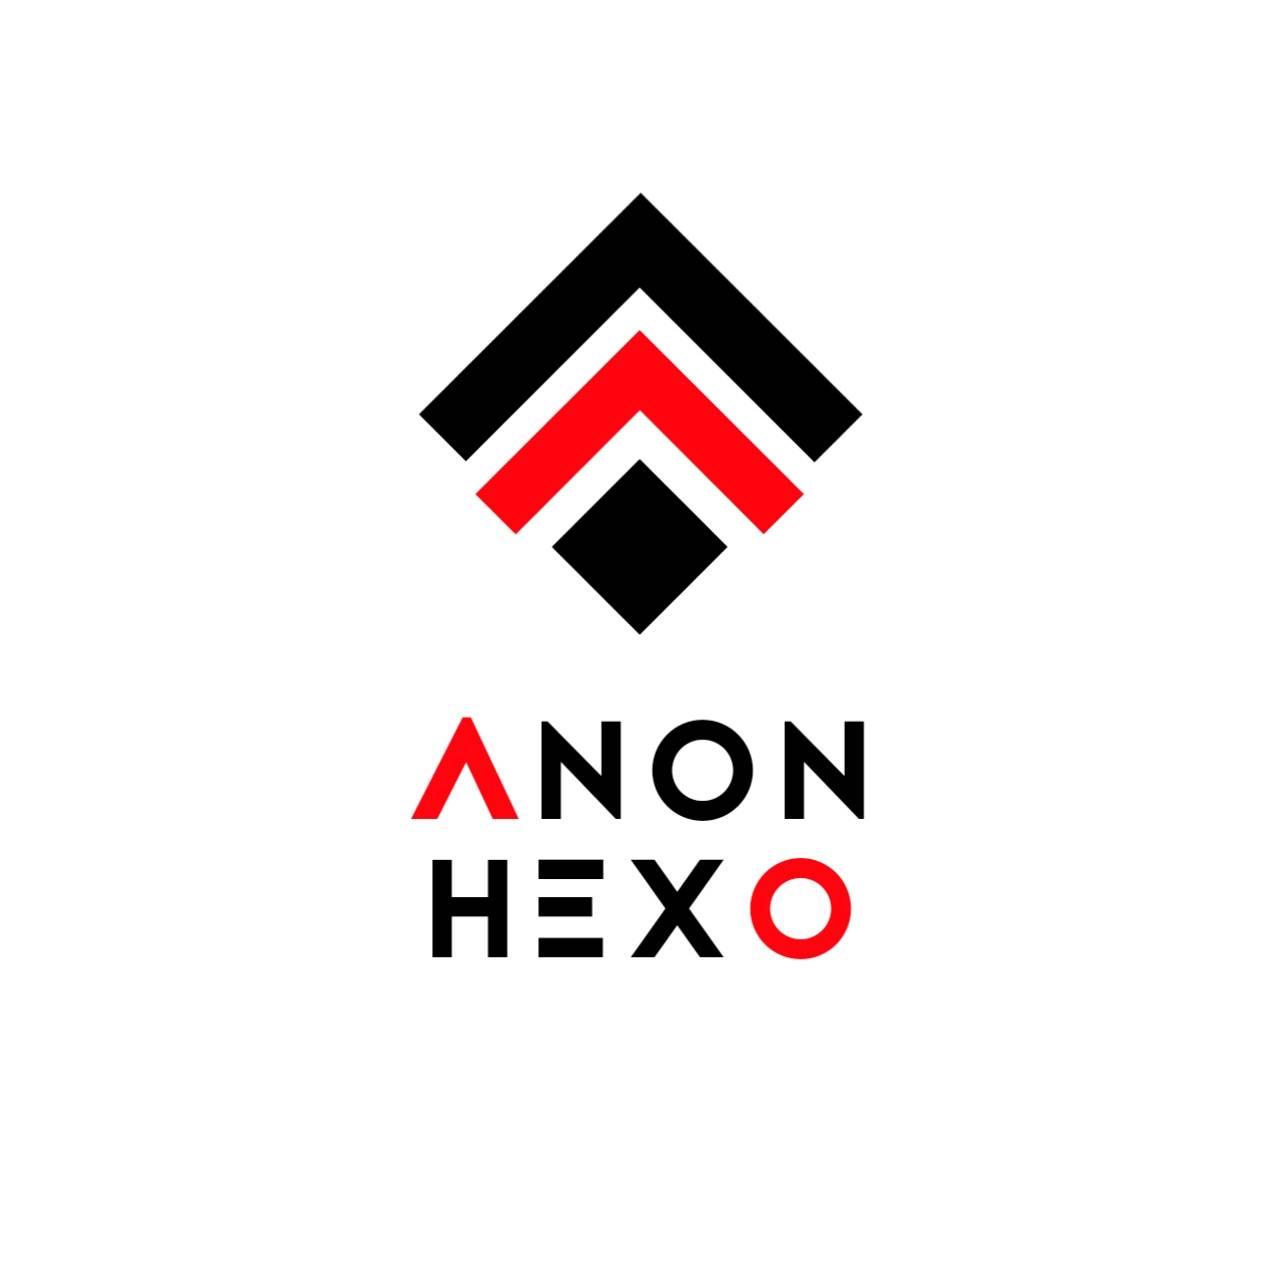 AnonHexo Wallpaper